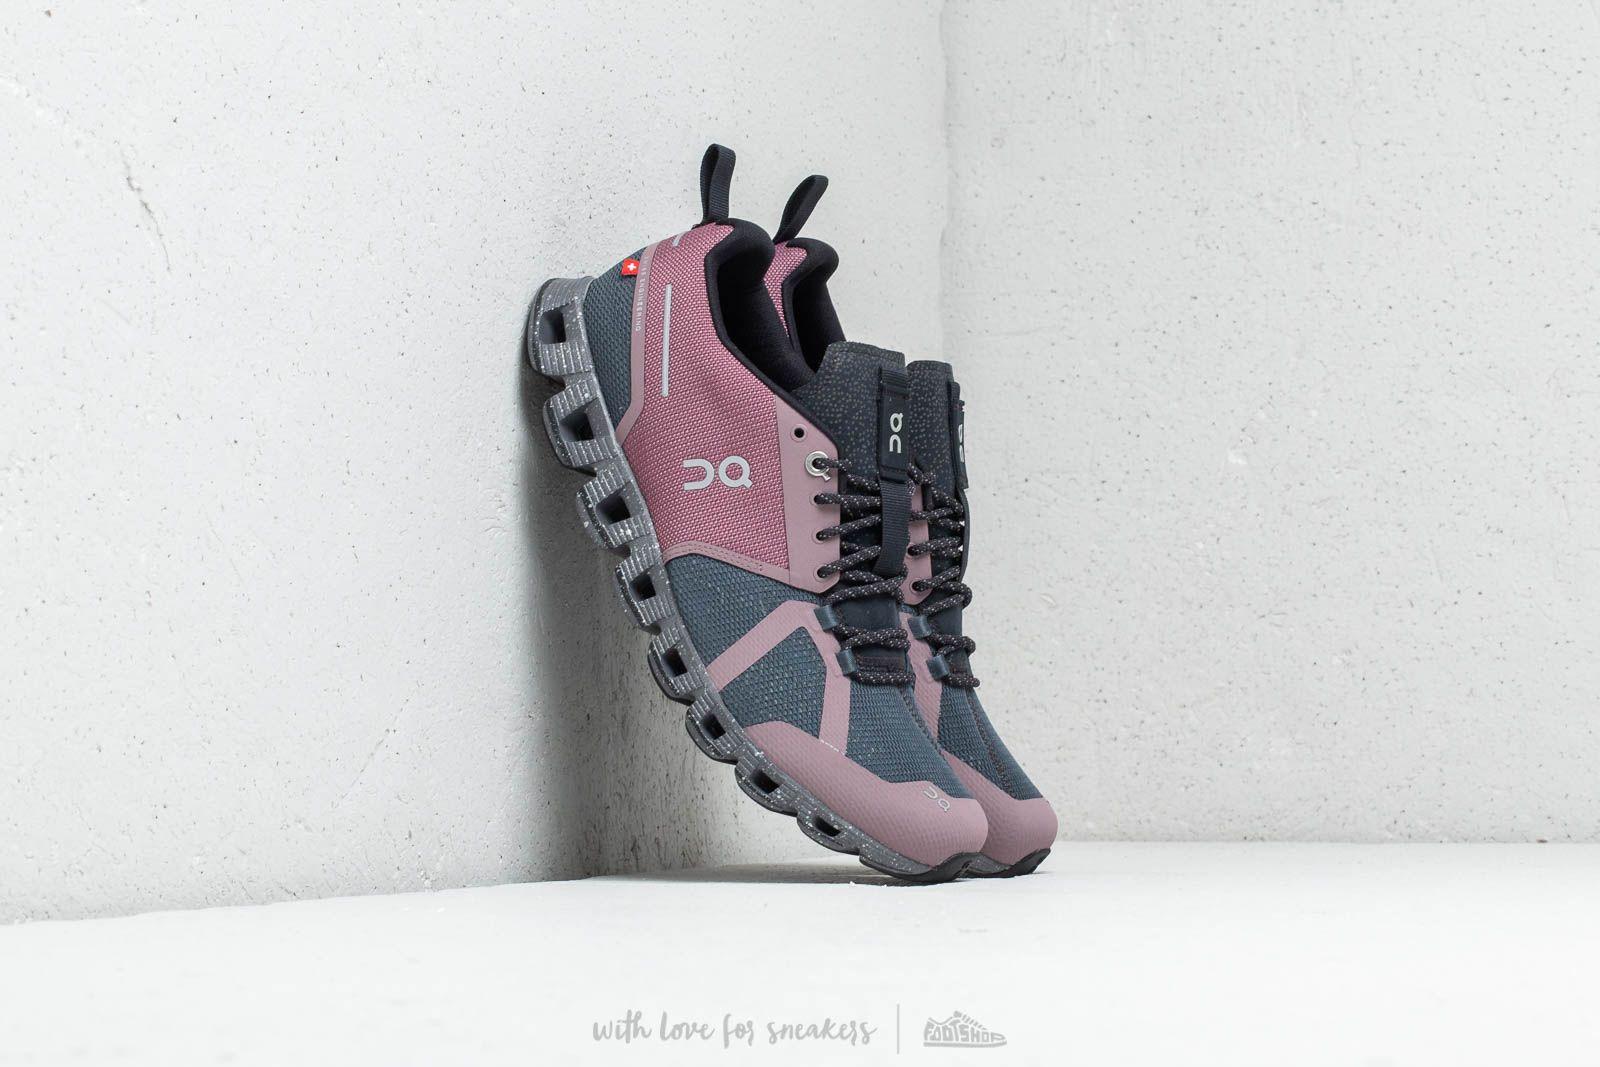 On Running Cloud Edge Moonlight Iris/ Dust za skvělou cenu 2 750 Kč koupíte na Footshop.cz